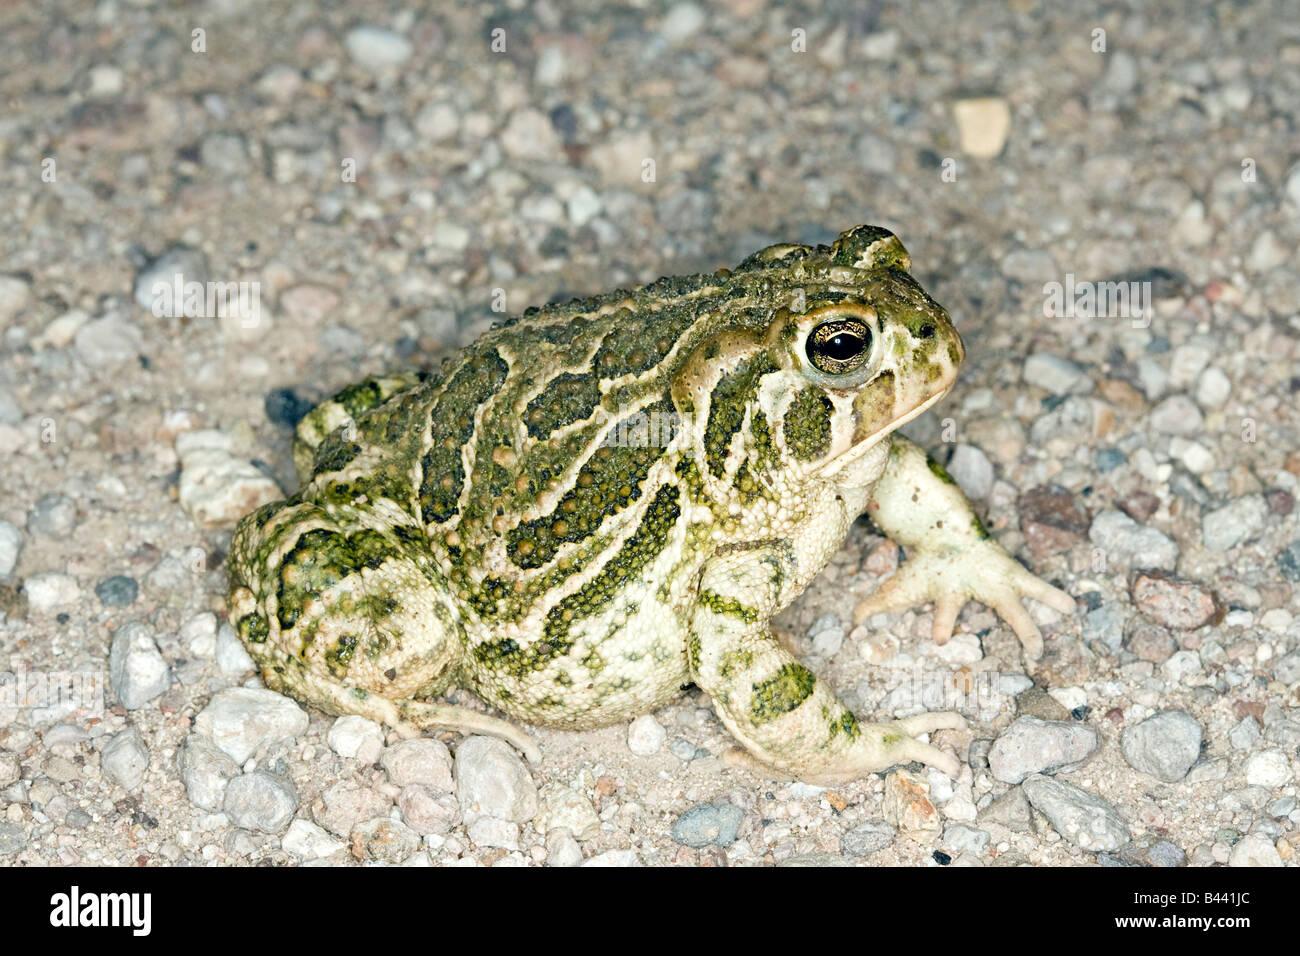 Great Plains Toad Bufo cognatus Tucson Pima County ARIZONA United States 18 August Adult Bufonidae - Stock Image